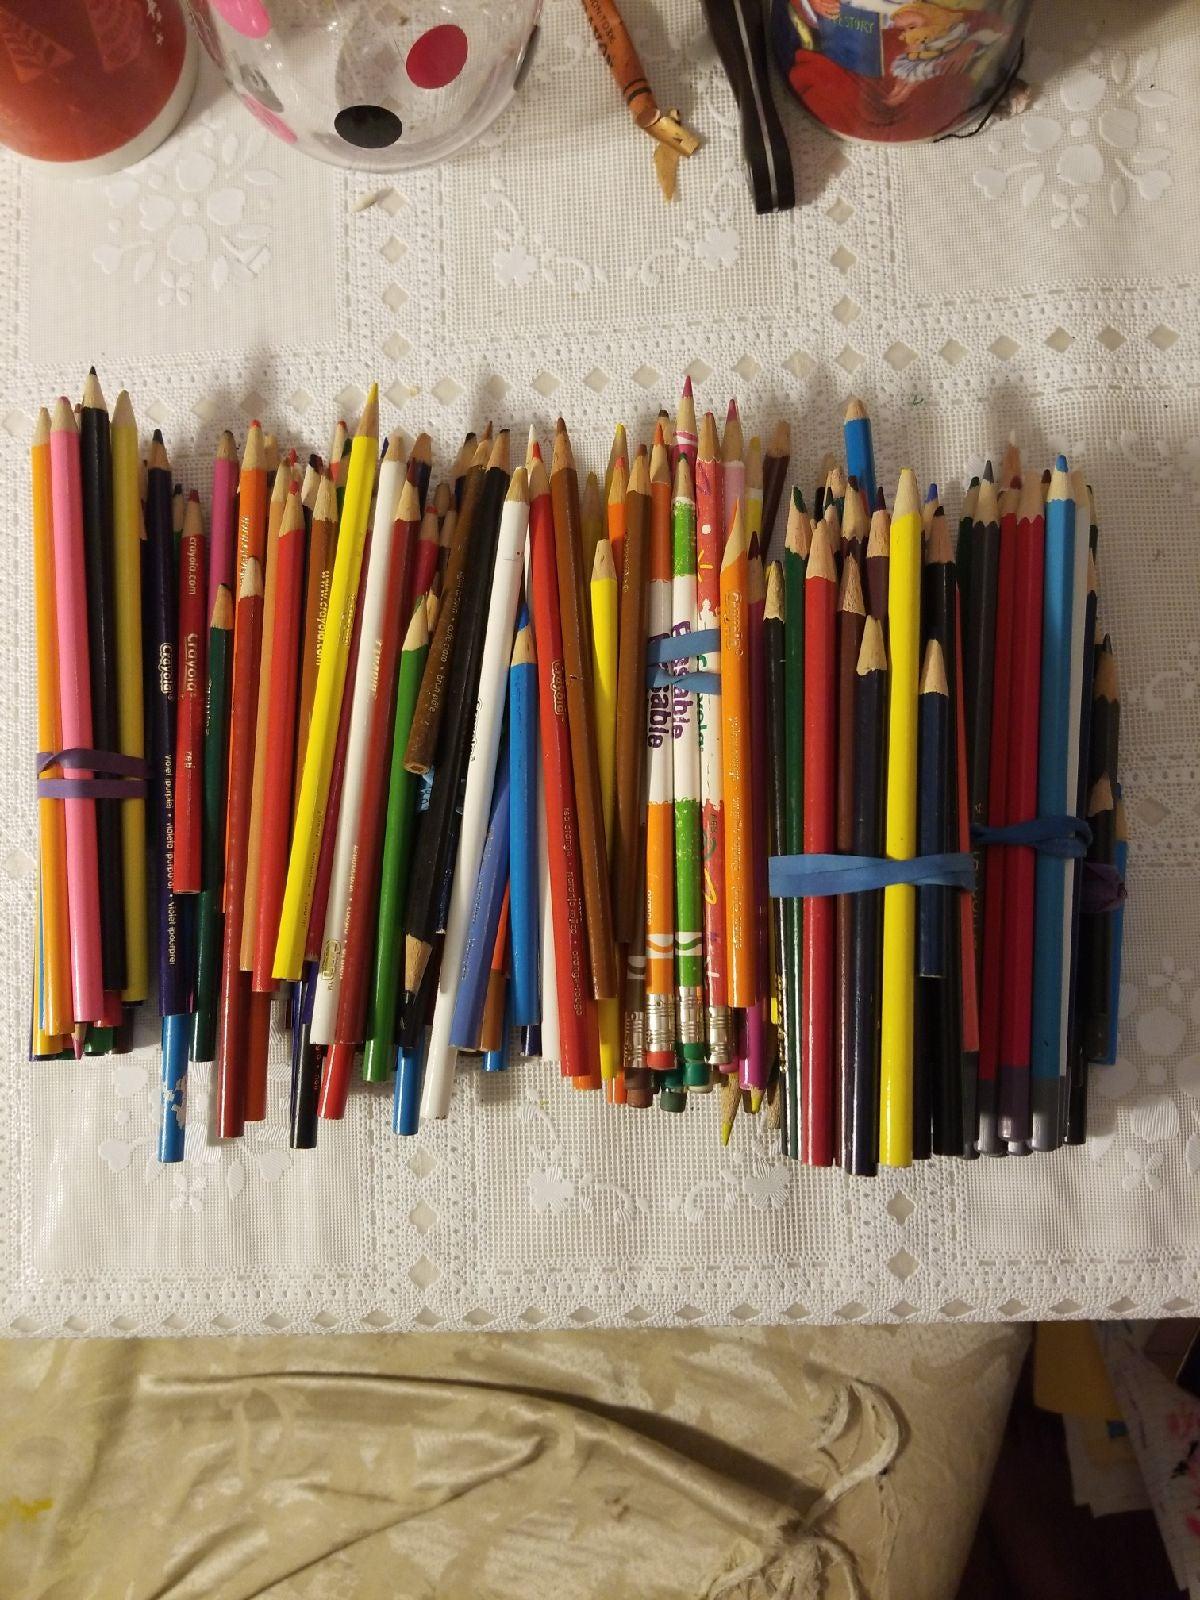 Colored pencils bulk